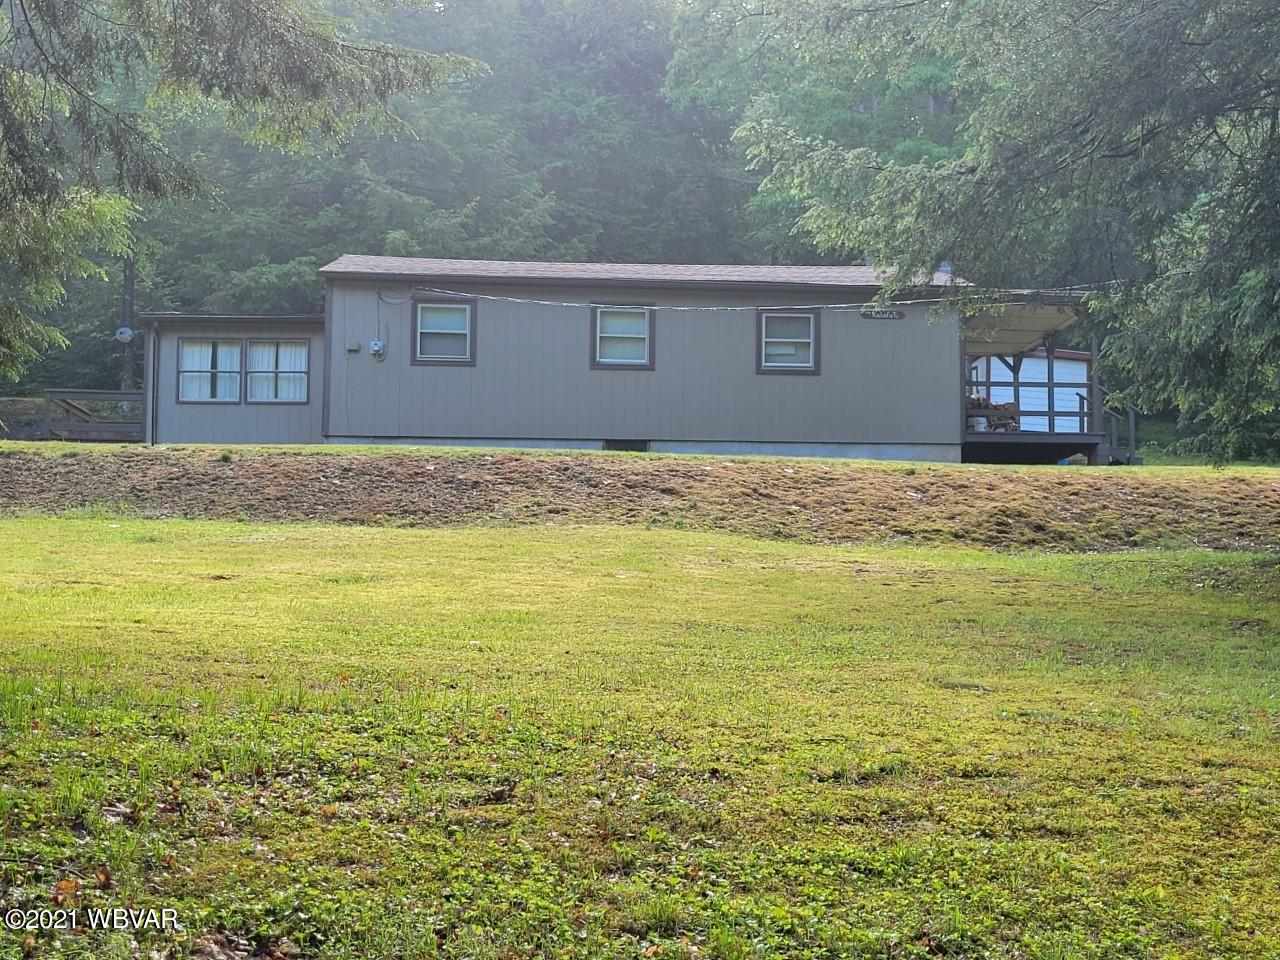 225 KALAFUT LANE, Westport, PA 17778, 2 Bedrooms Bedrooms, ,Cabin/vacation home,For sale,KALAFUT,WB-92730